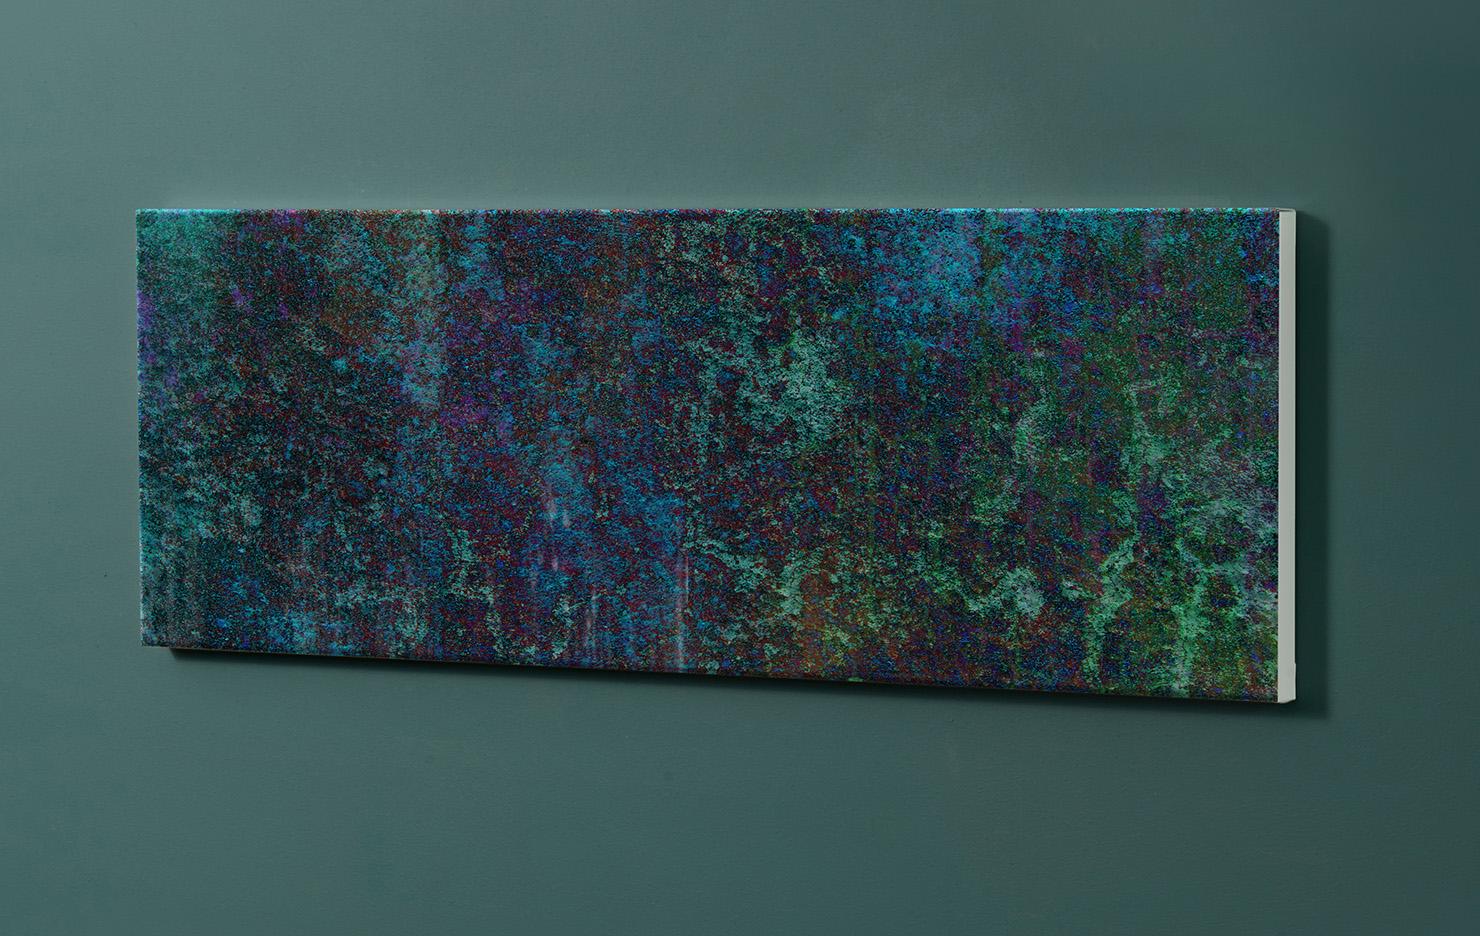 Magnettafel NOTIZ 90x30cm Motiv-Pinnwand M06 Abstrakt Kunst